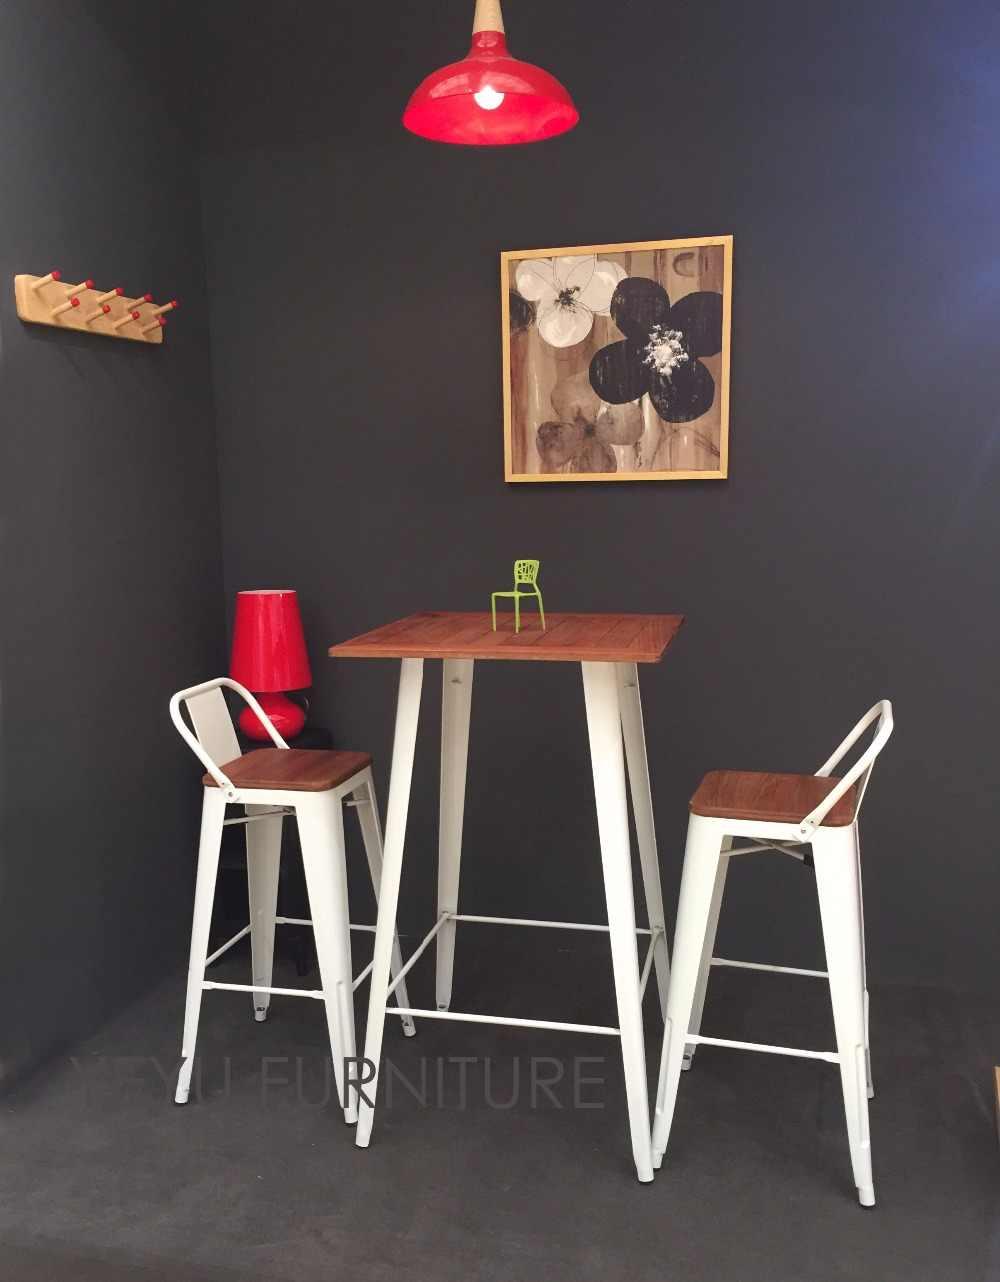 Minimalist modern design low back outdoor metal steel bar stool with teak wood seat commercial bar